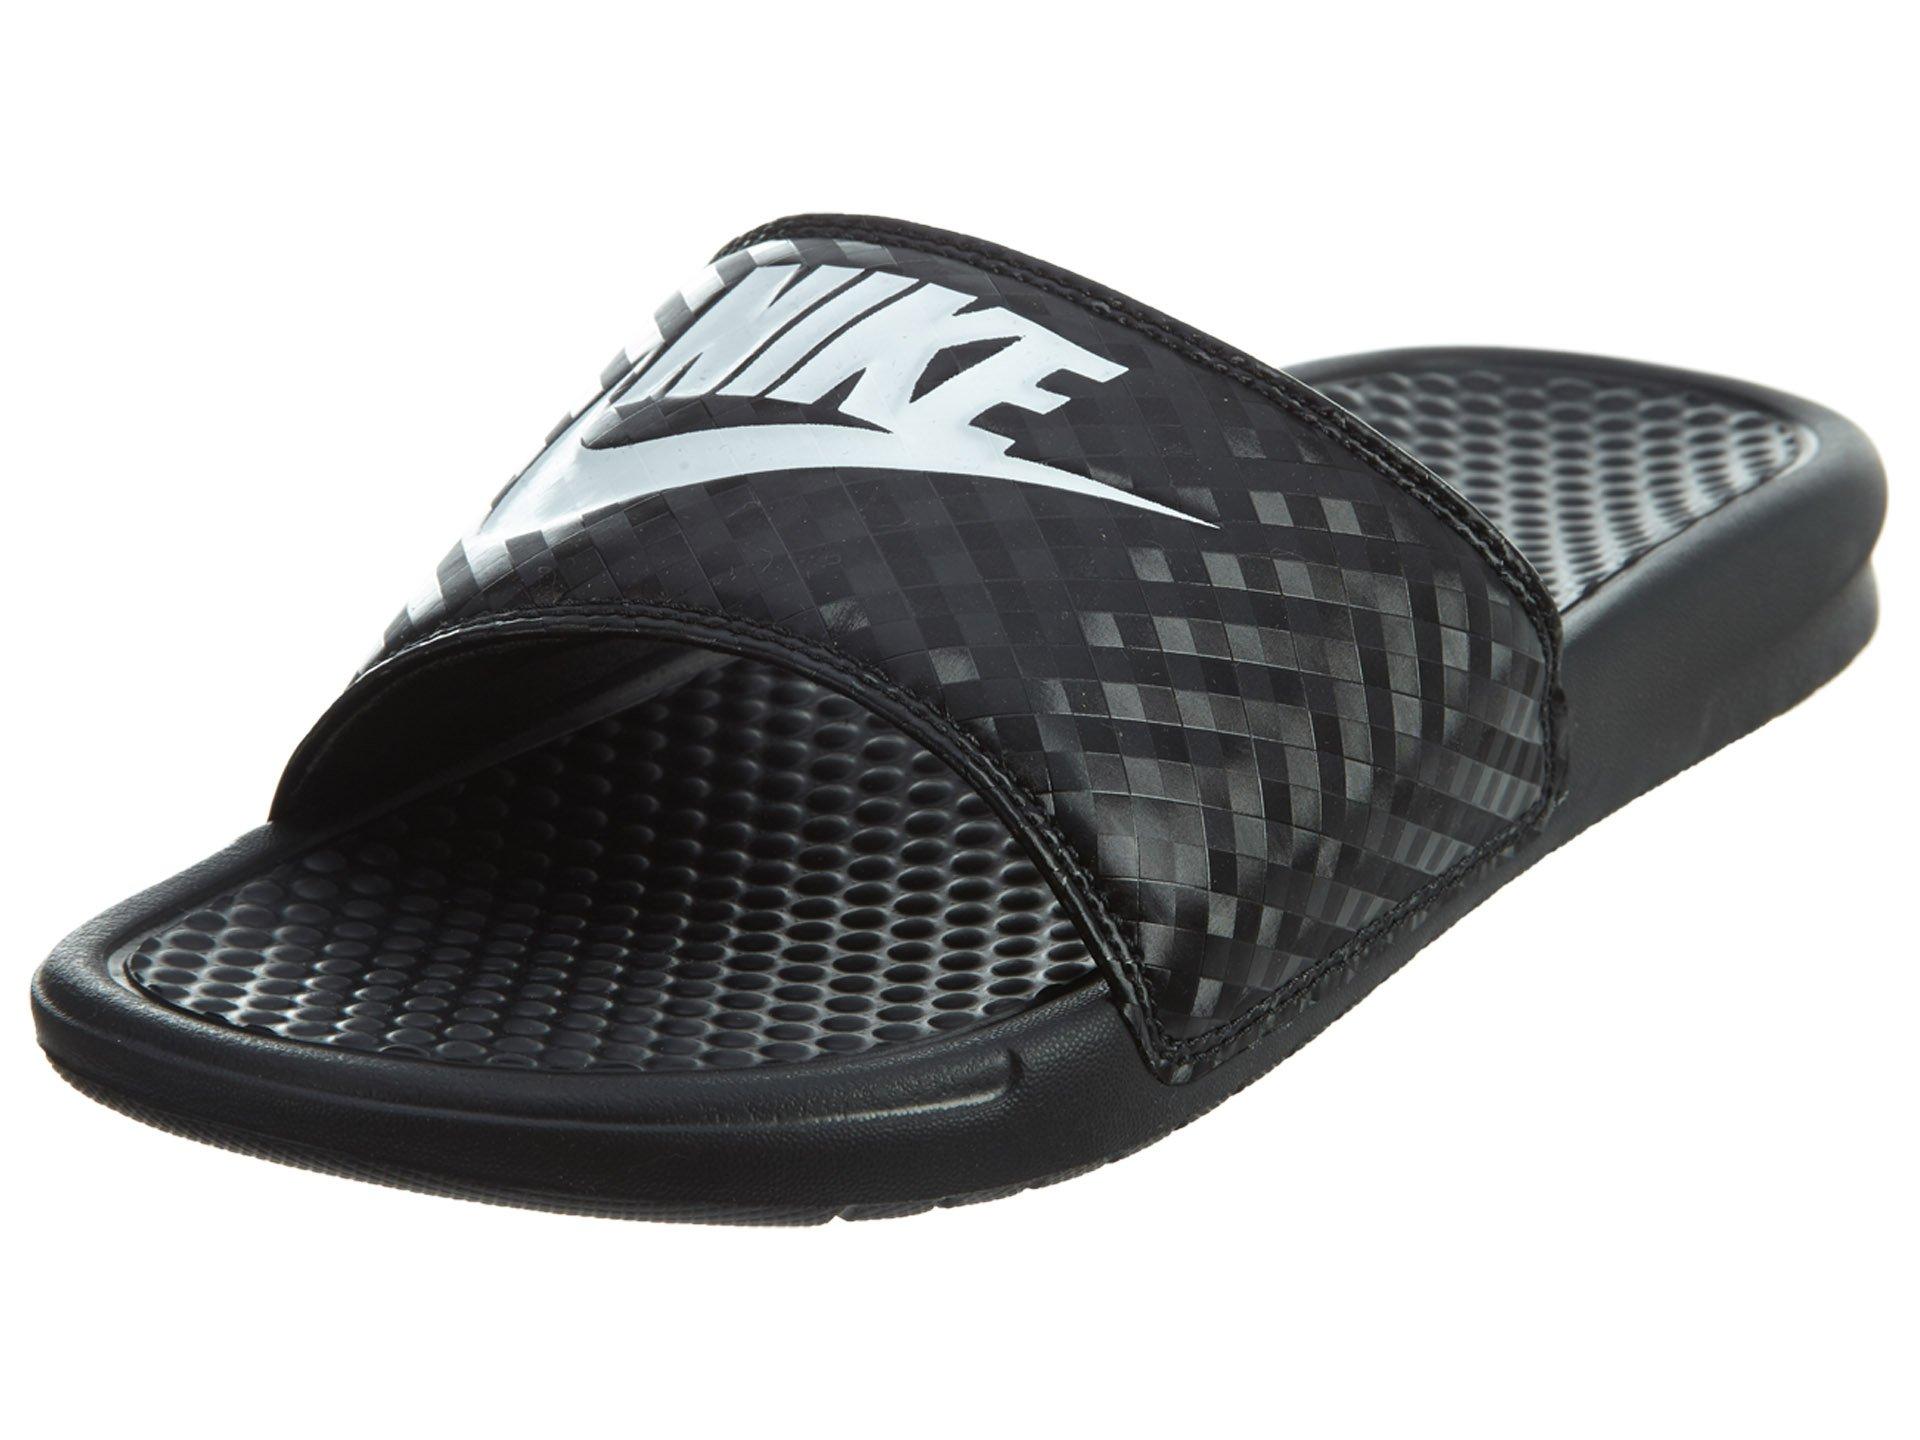 best sneakers 95f8b 17d87 Nike Benassi Just Do It, Chaussures de Plage   Piscine Femme product image